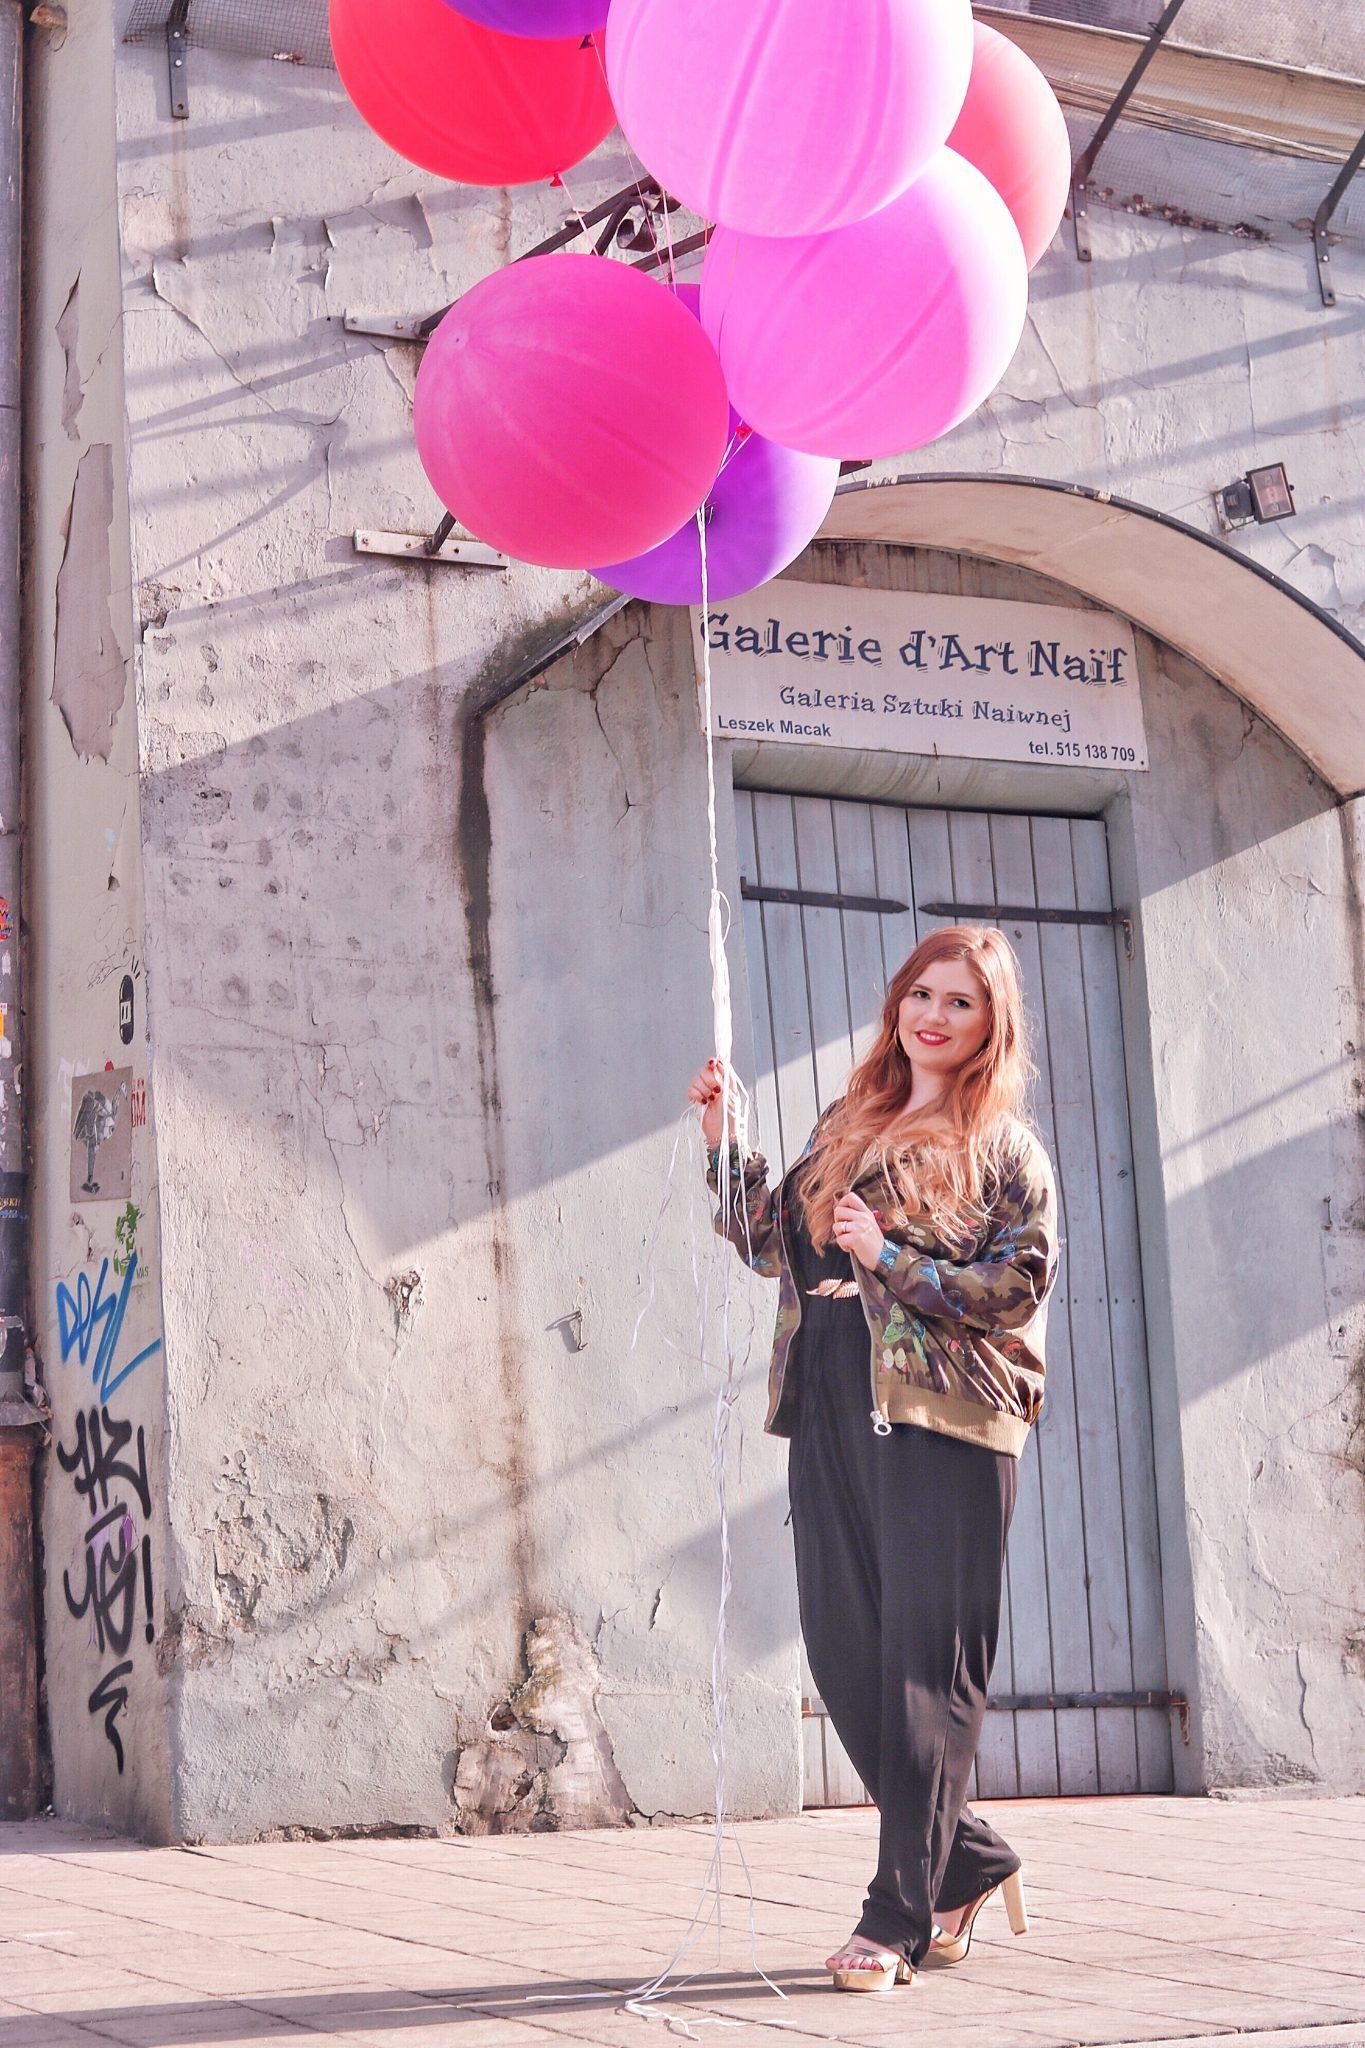 luftballon-fashion-lifestyle-blogger-hamburg